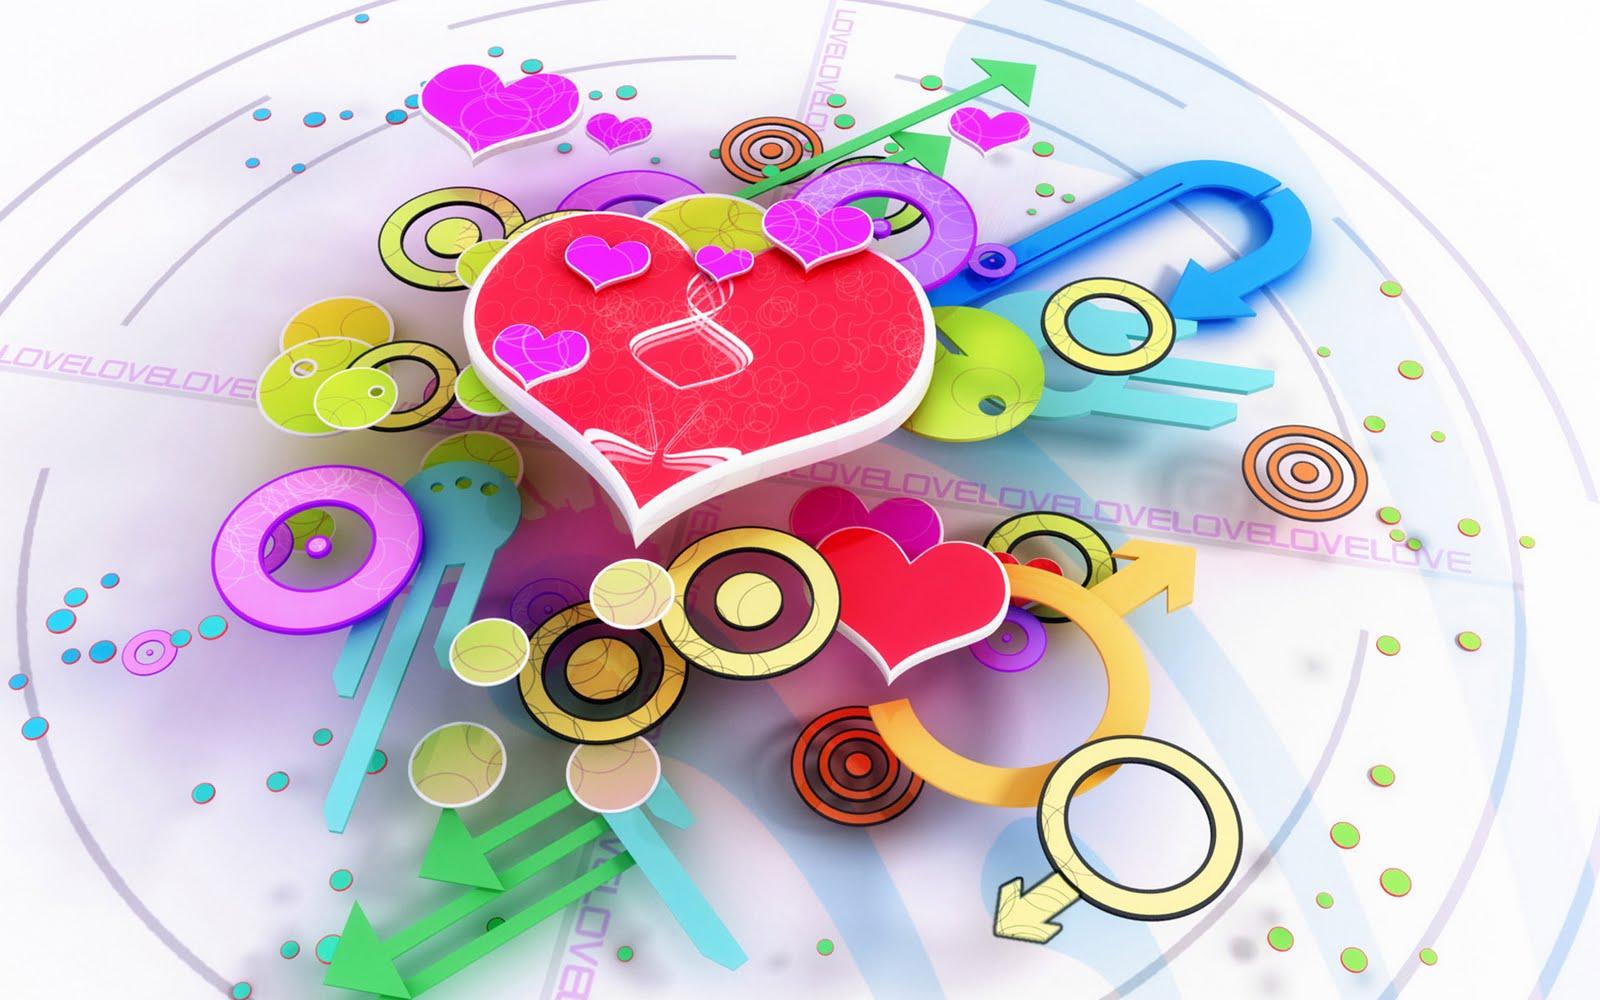 http://4.bp.blogspot.com/_9JS1XqG9_G8/S_AecCDBQcI/AAAAAAAAANo/3wf88dj4nHY/s1600/Love_Abstract_3D.jpg